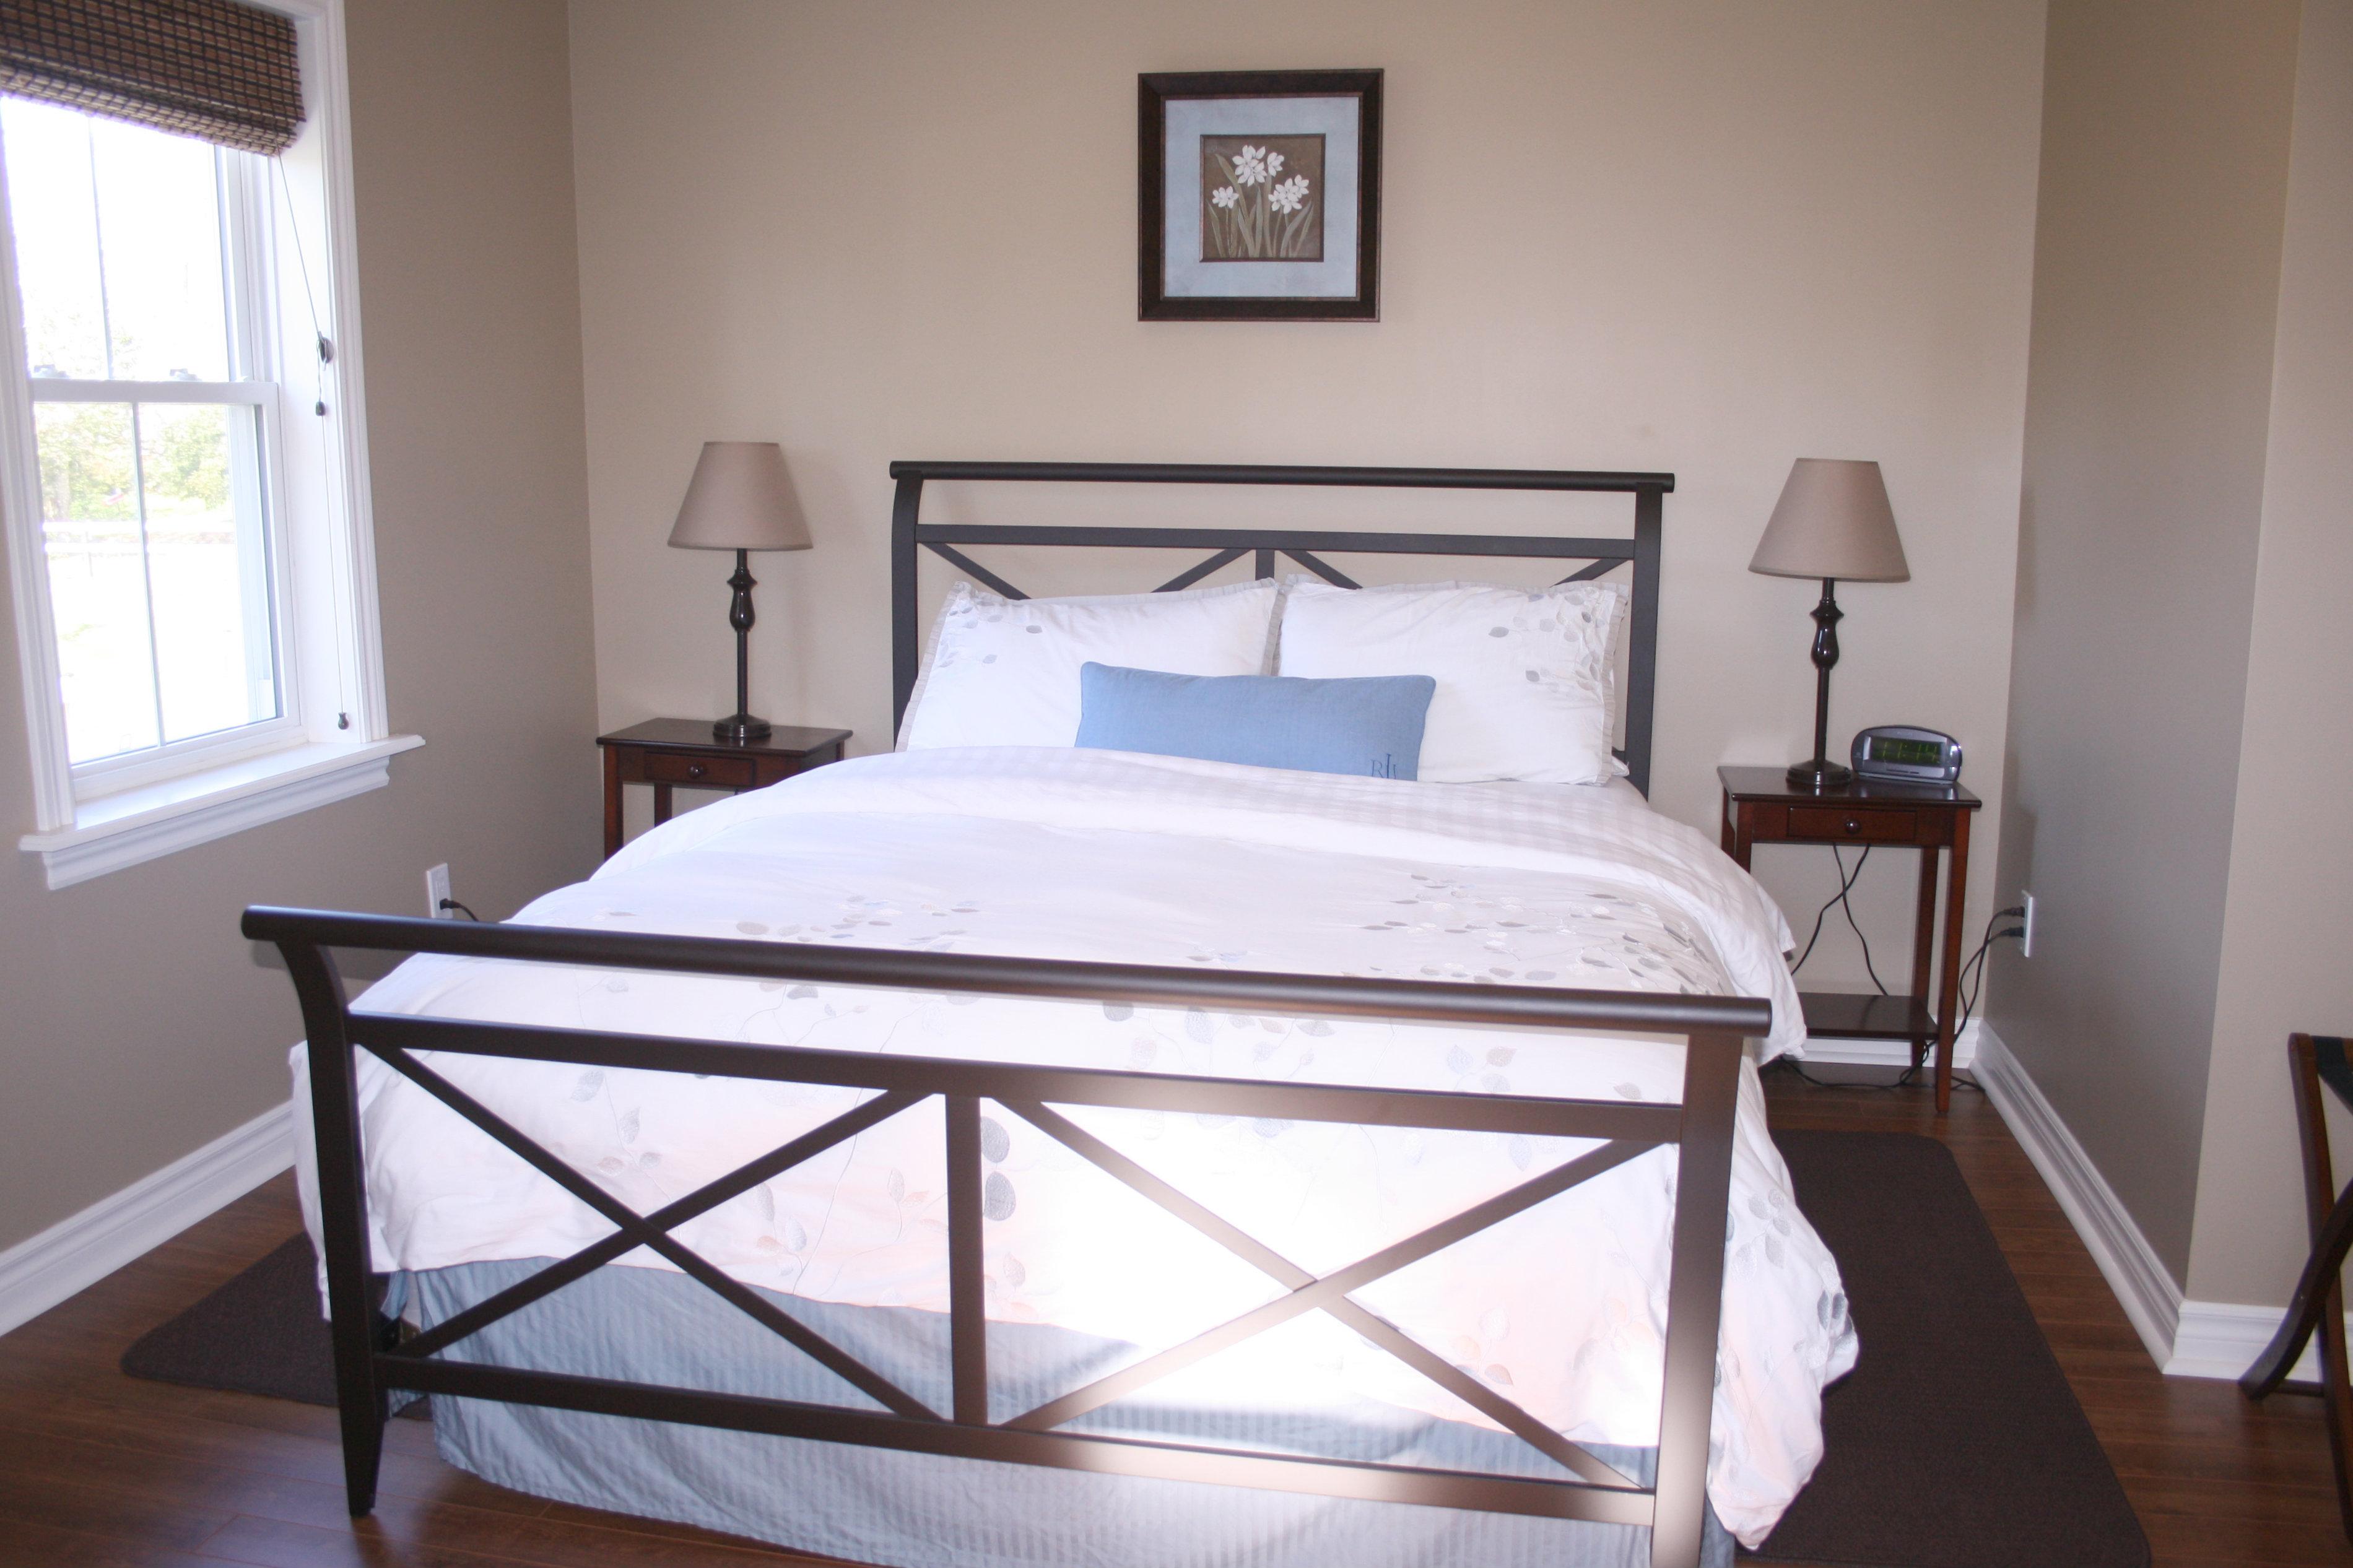 Hillside Bed